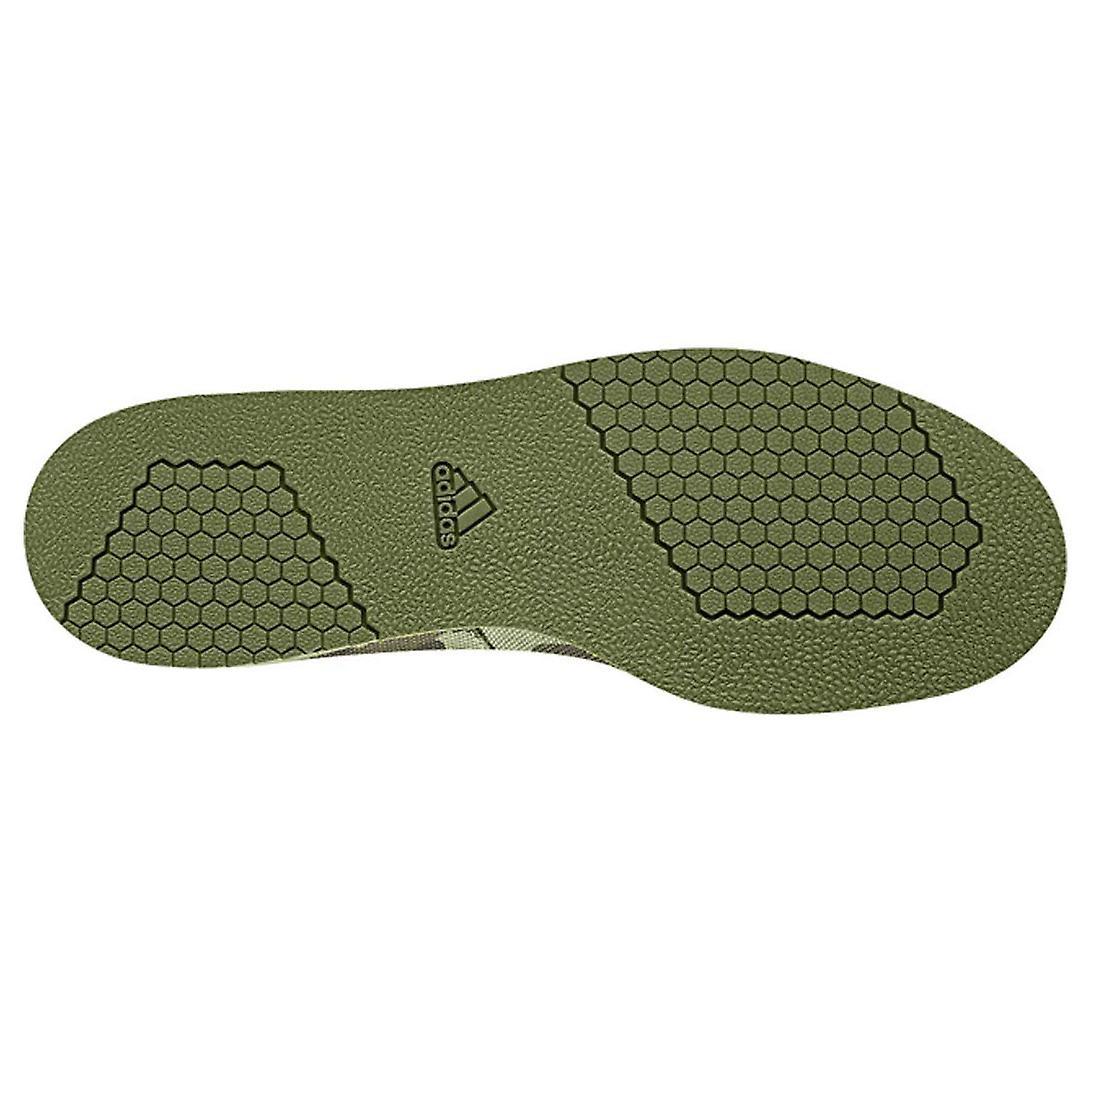 adidas Powerlift 4 Mens Weightlifting Powerlifting Shoe Olive